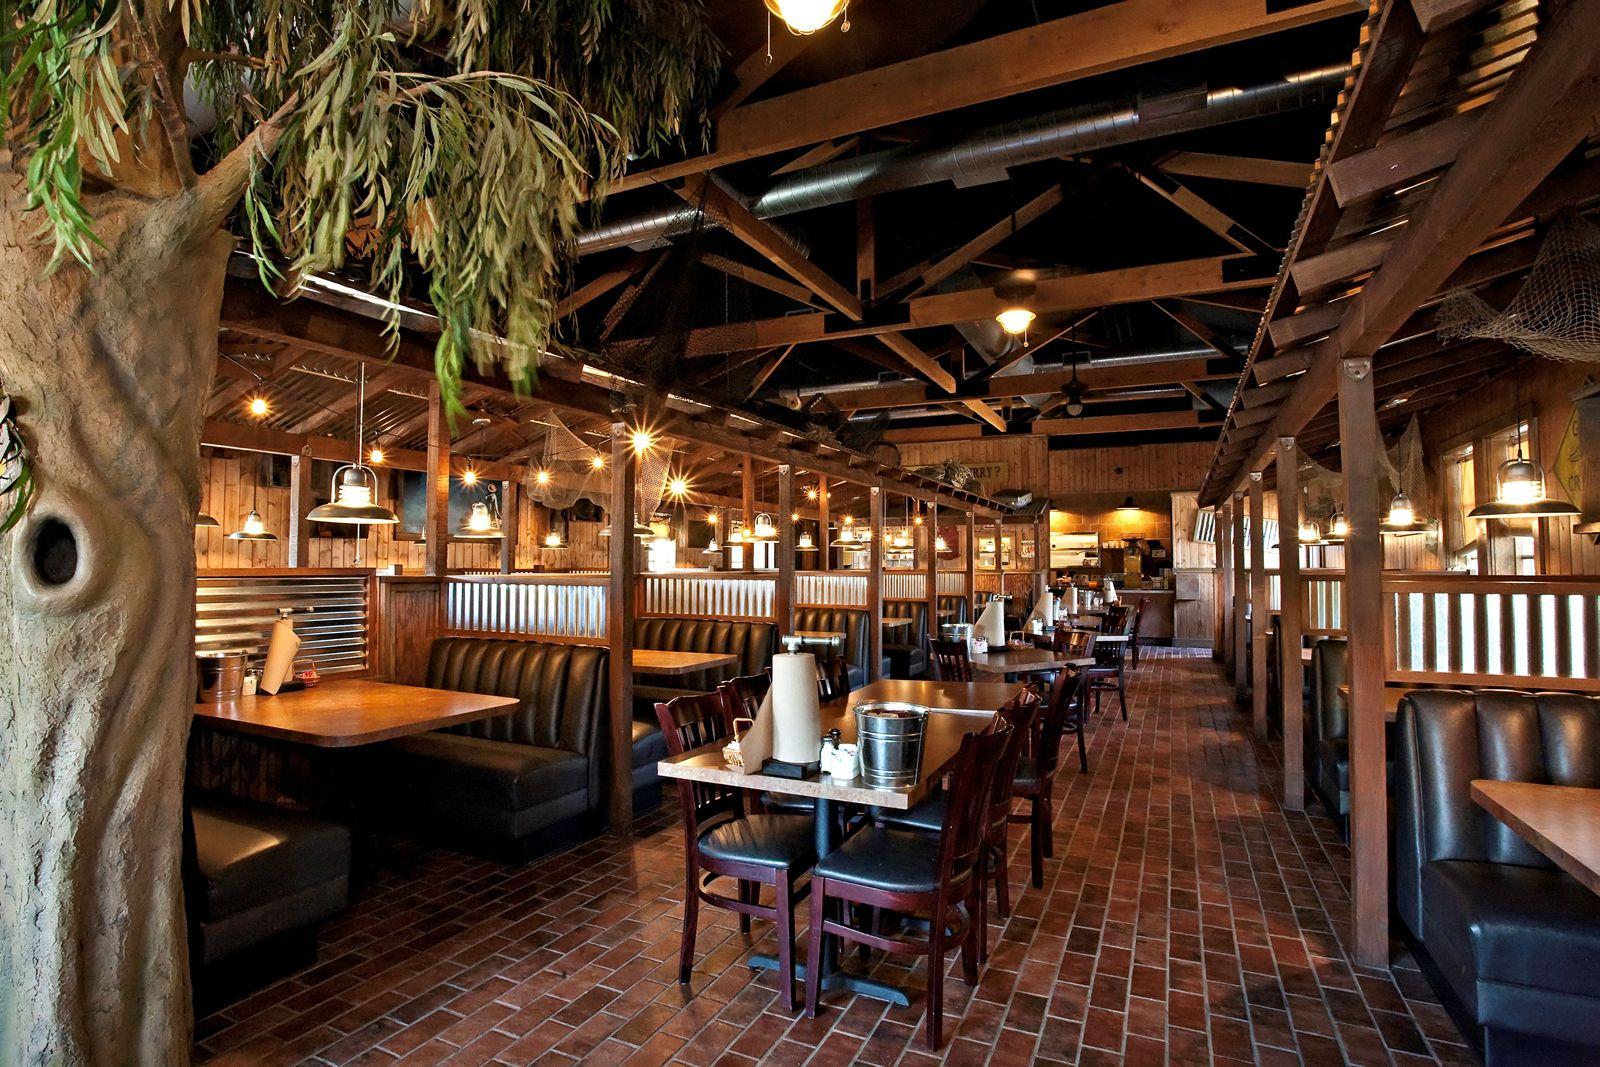 Huckleberry's Breakfast & Lunch Opening in Concord, CA